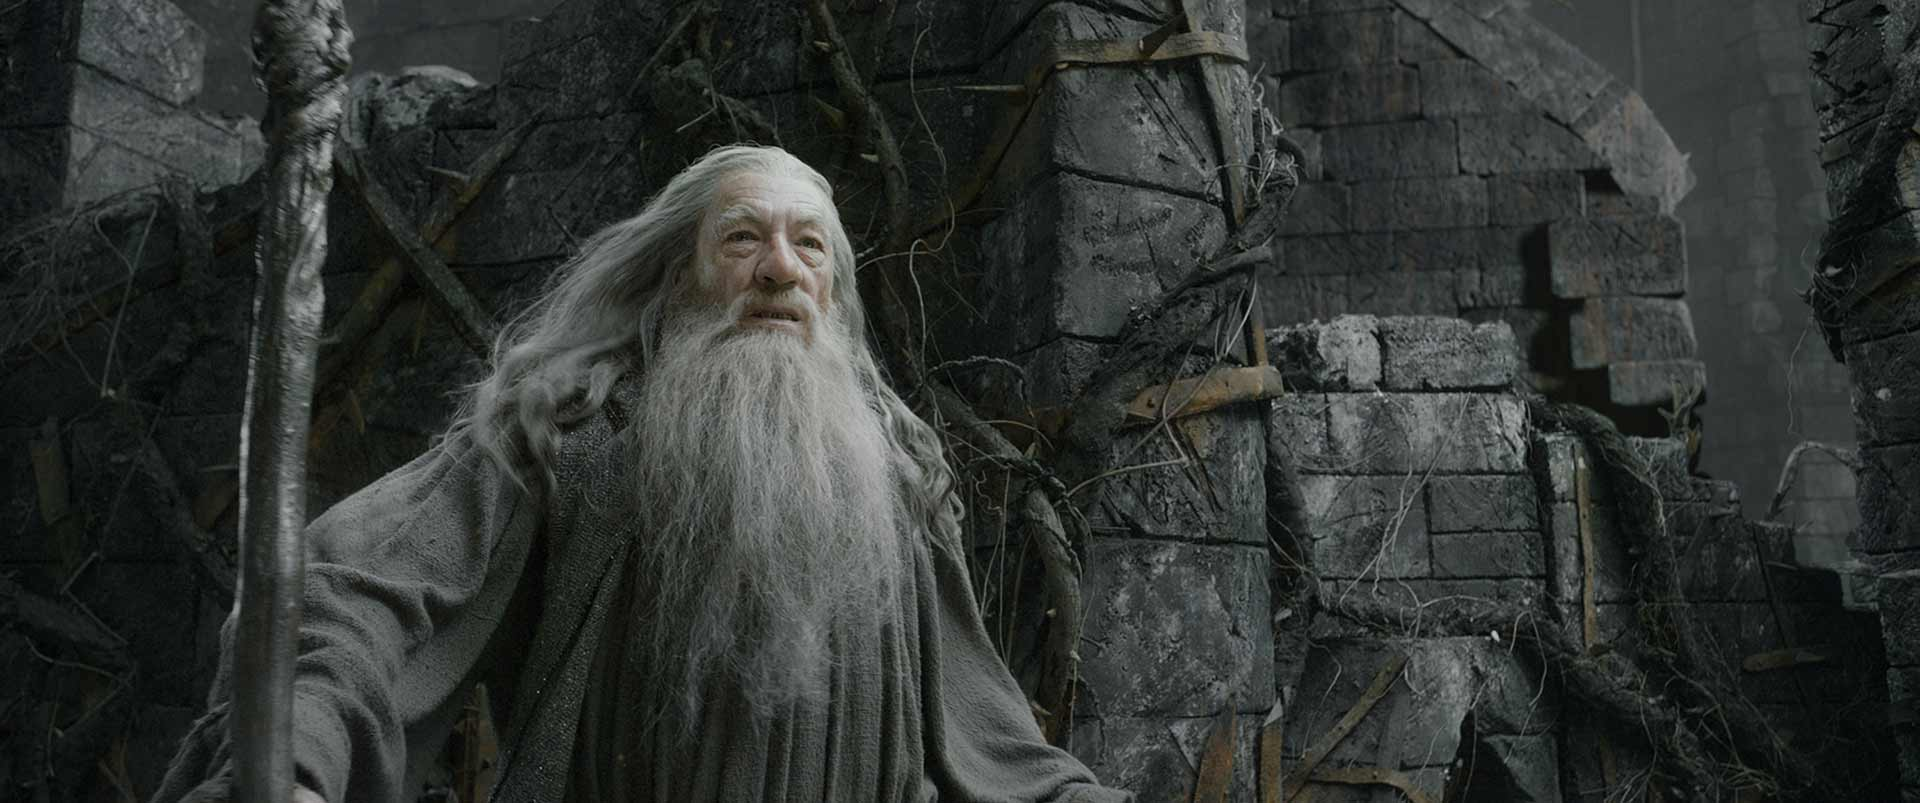 Gandalf Wallpapers 1920x803